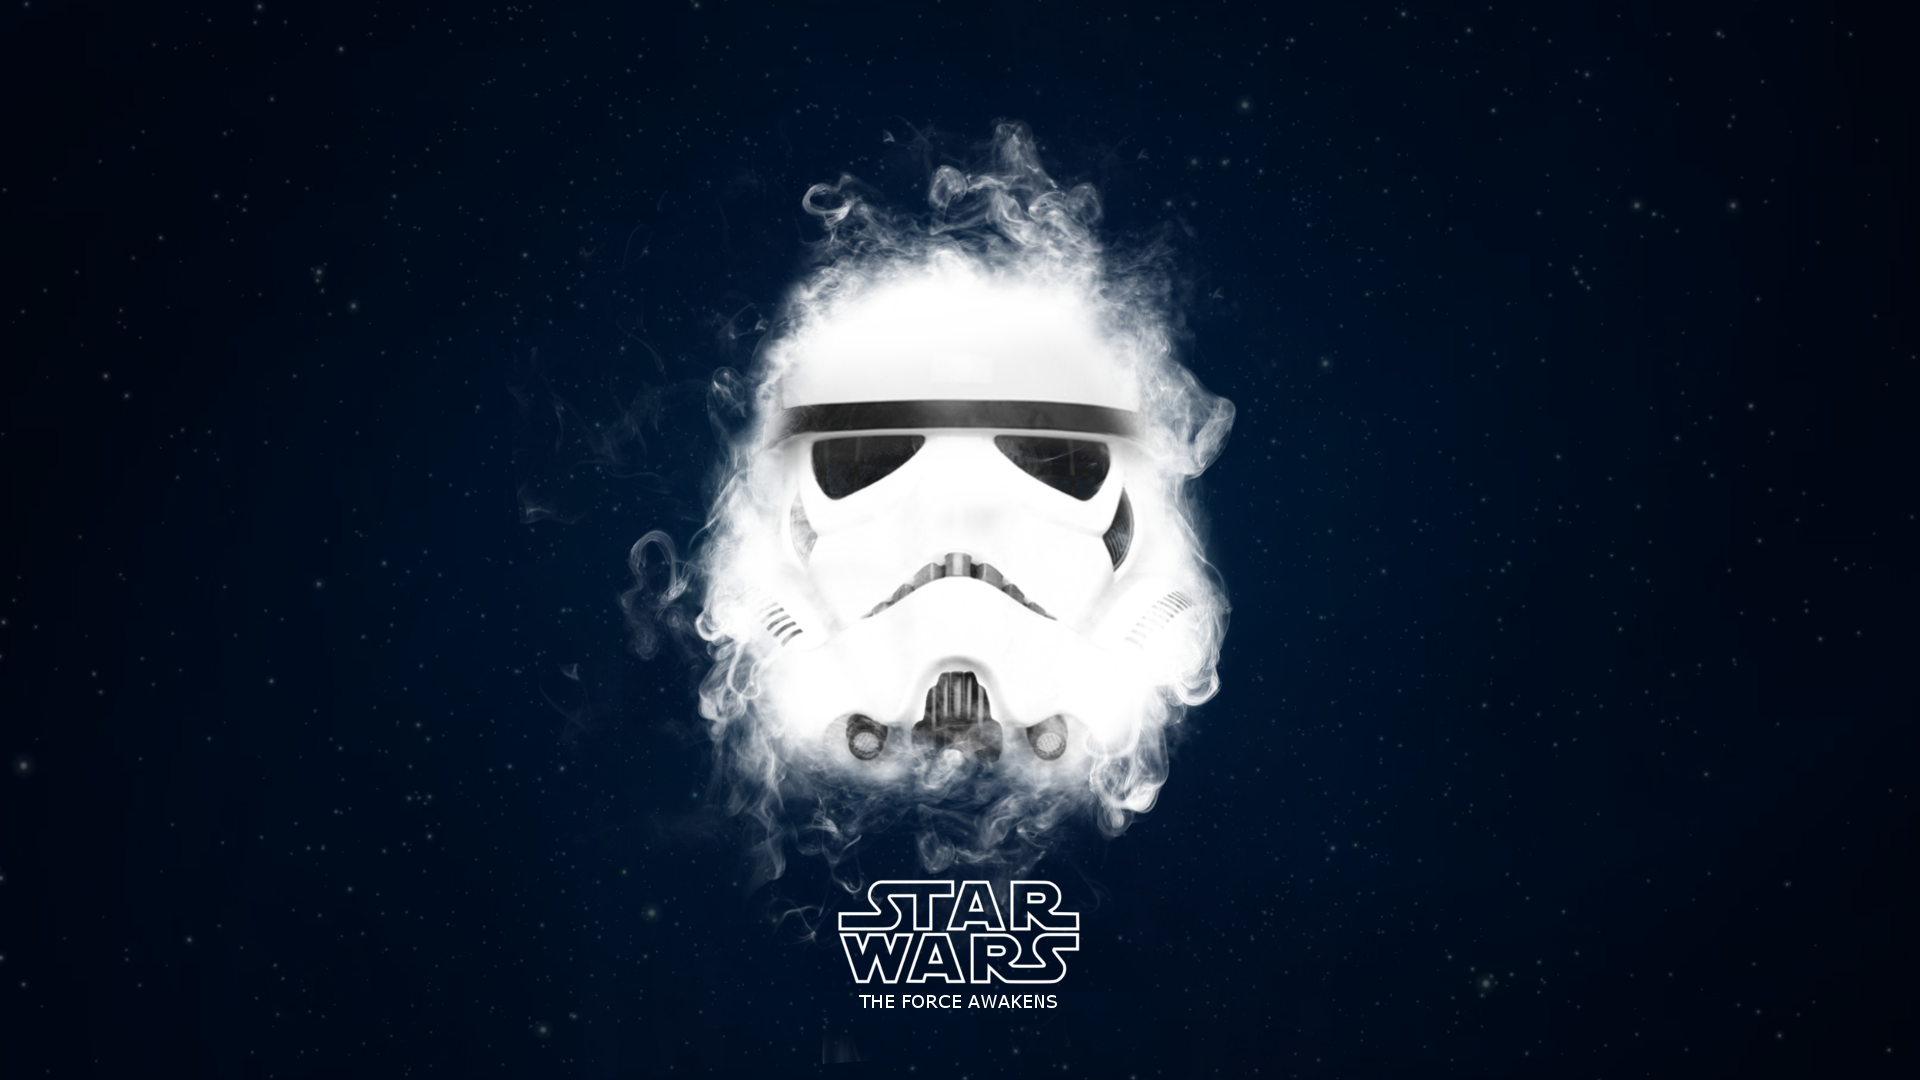 ... Star Wars - Stormtrooper - The Force Awakens by TLDesignn